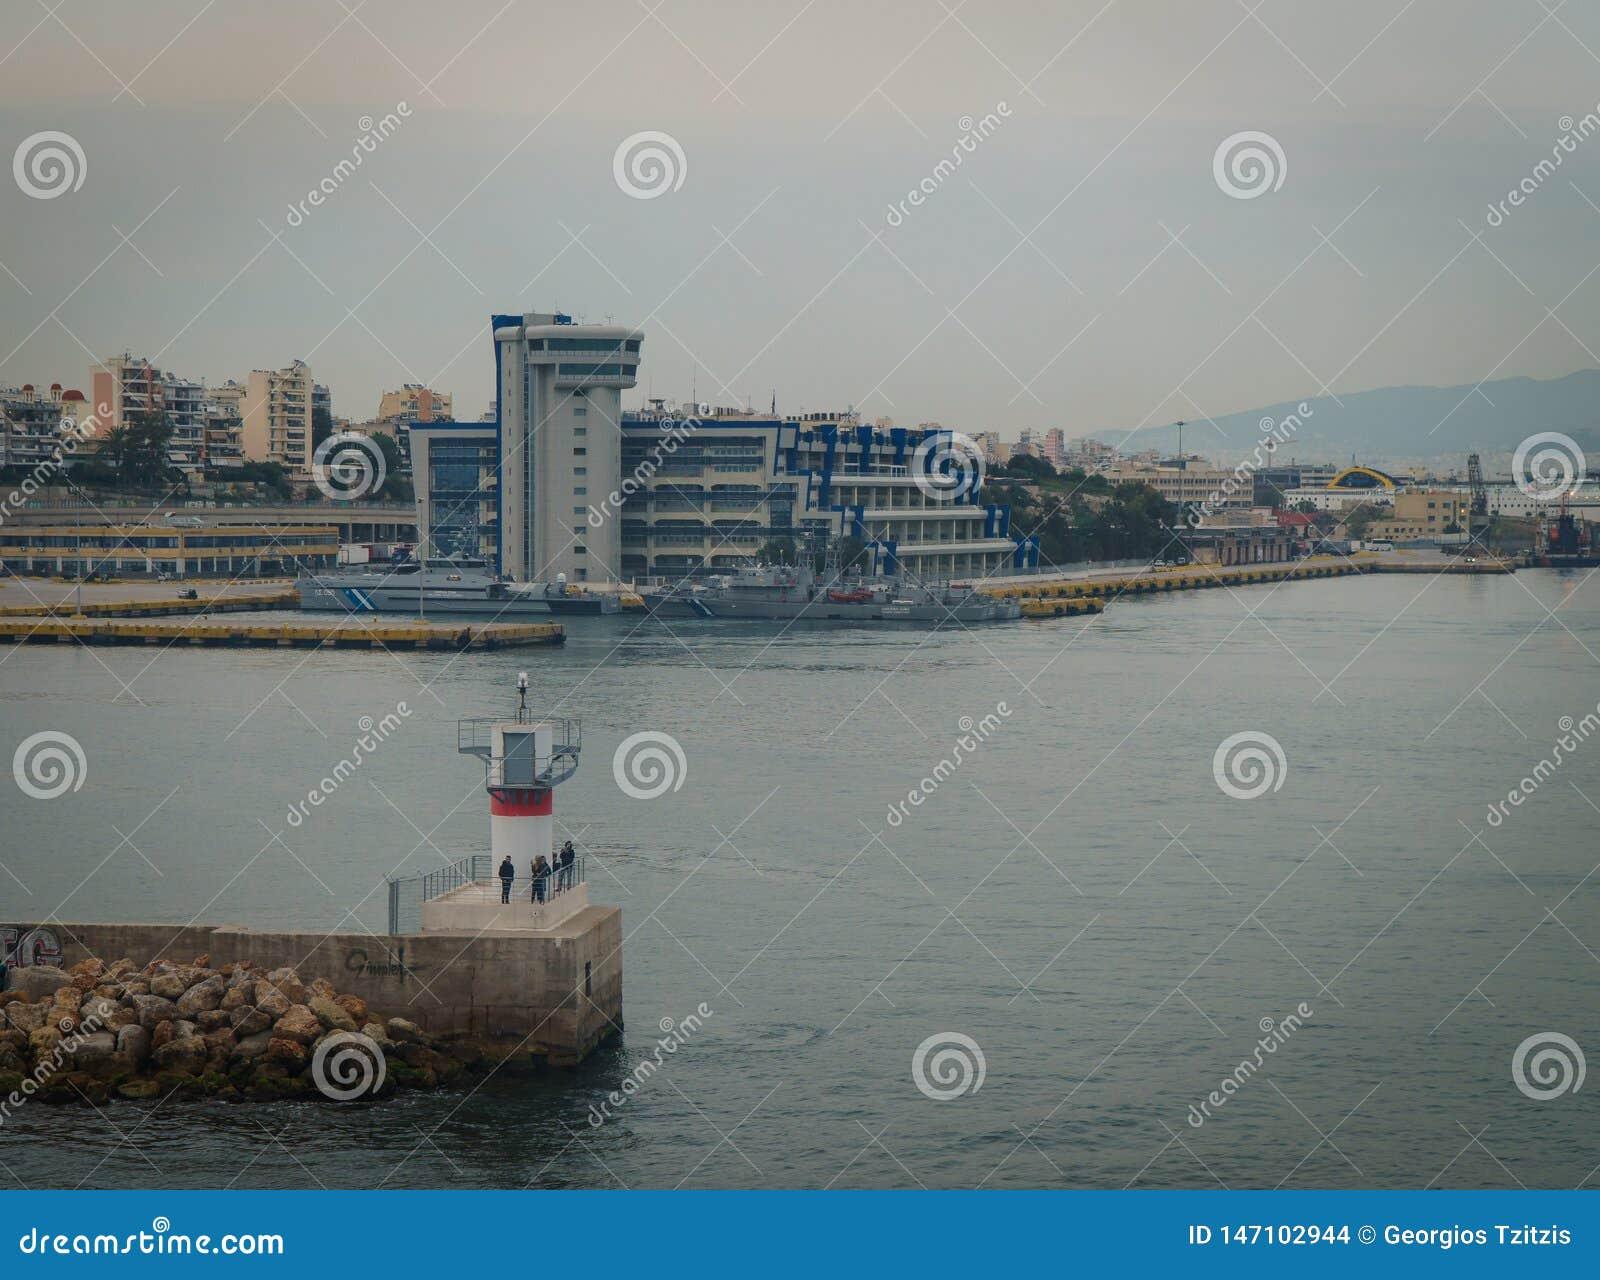 Conseptual που πυροβολείται του σκάφους που αφήνει στο λιμένα τα άλλα σκάφη και τον πύργο εντολής, σε μια νεφελώδη ημέρα με την ή